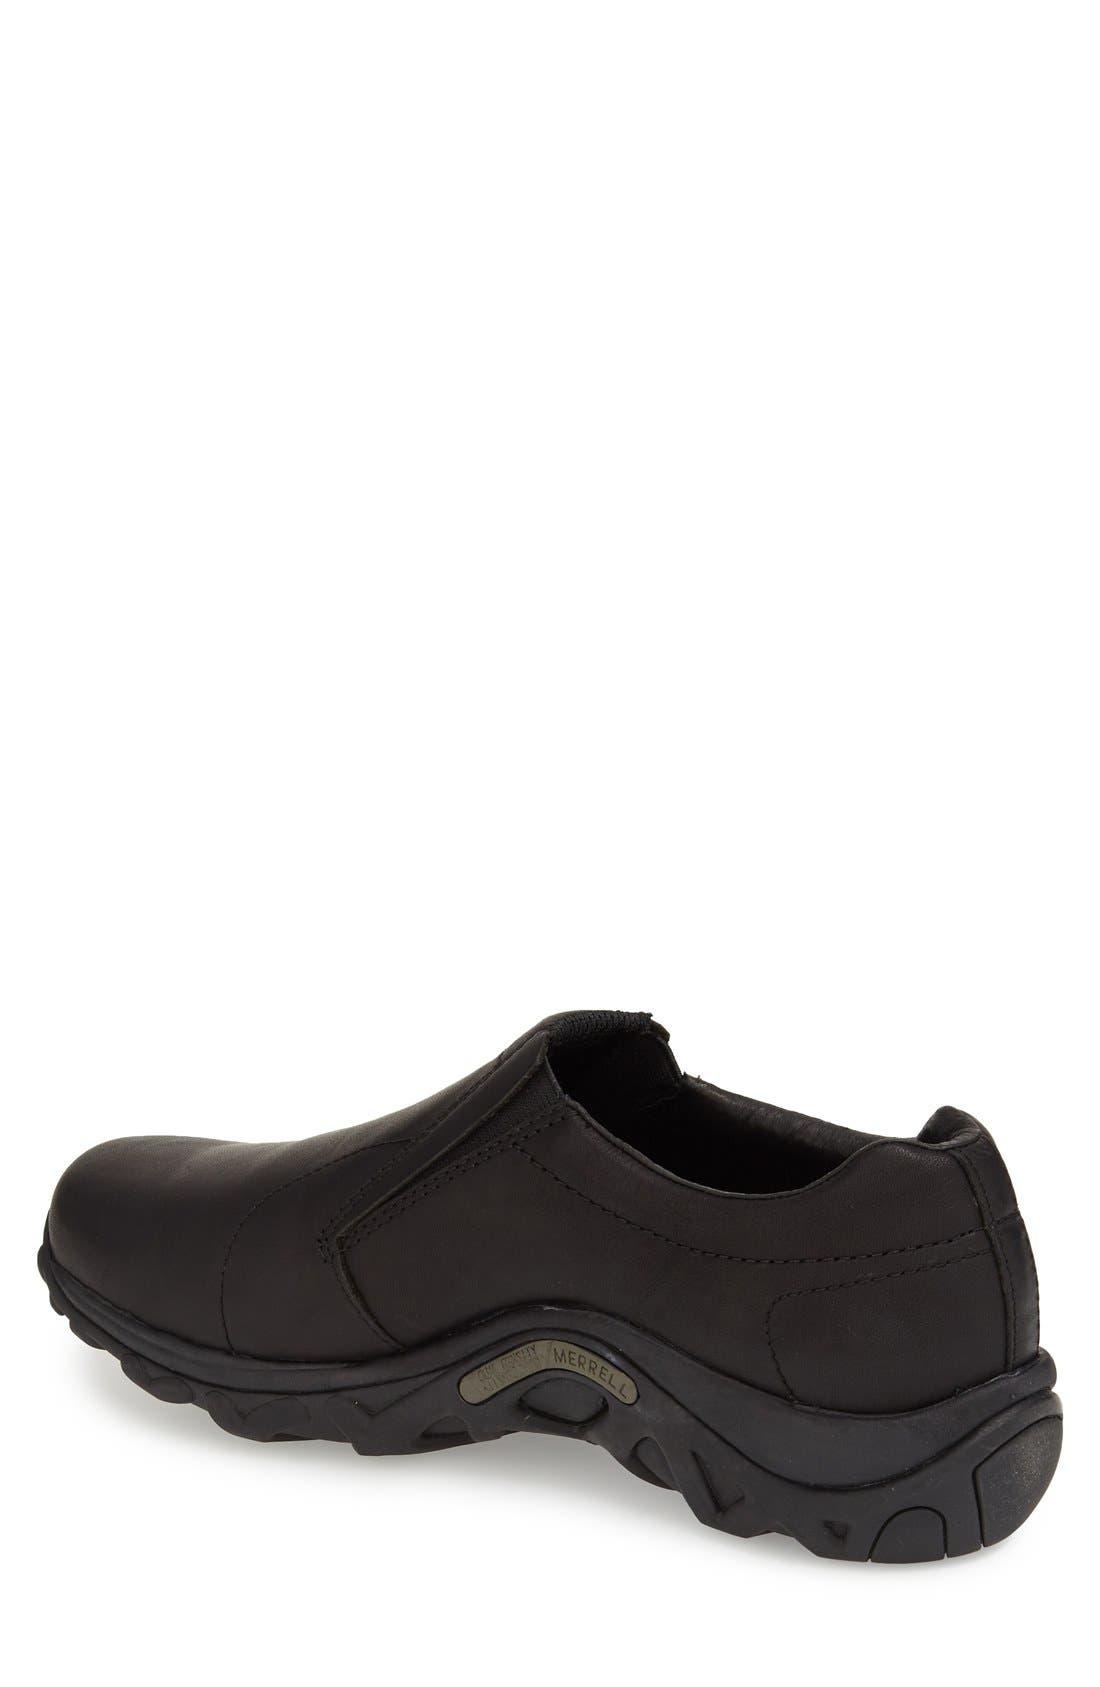 MERRELL, 'Jungle Moc' Leather Athletic Slip-On, Alternate thumbnail 3, color, BLACK